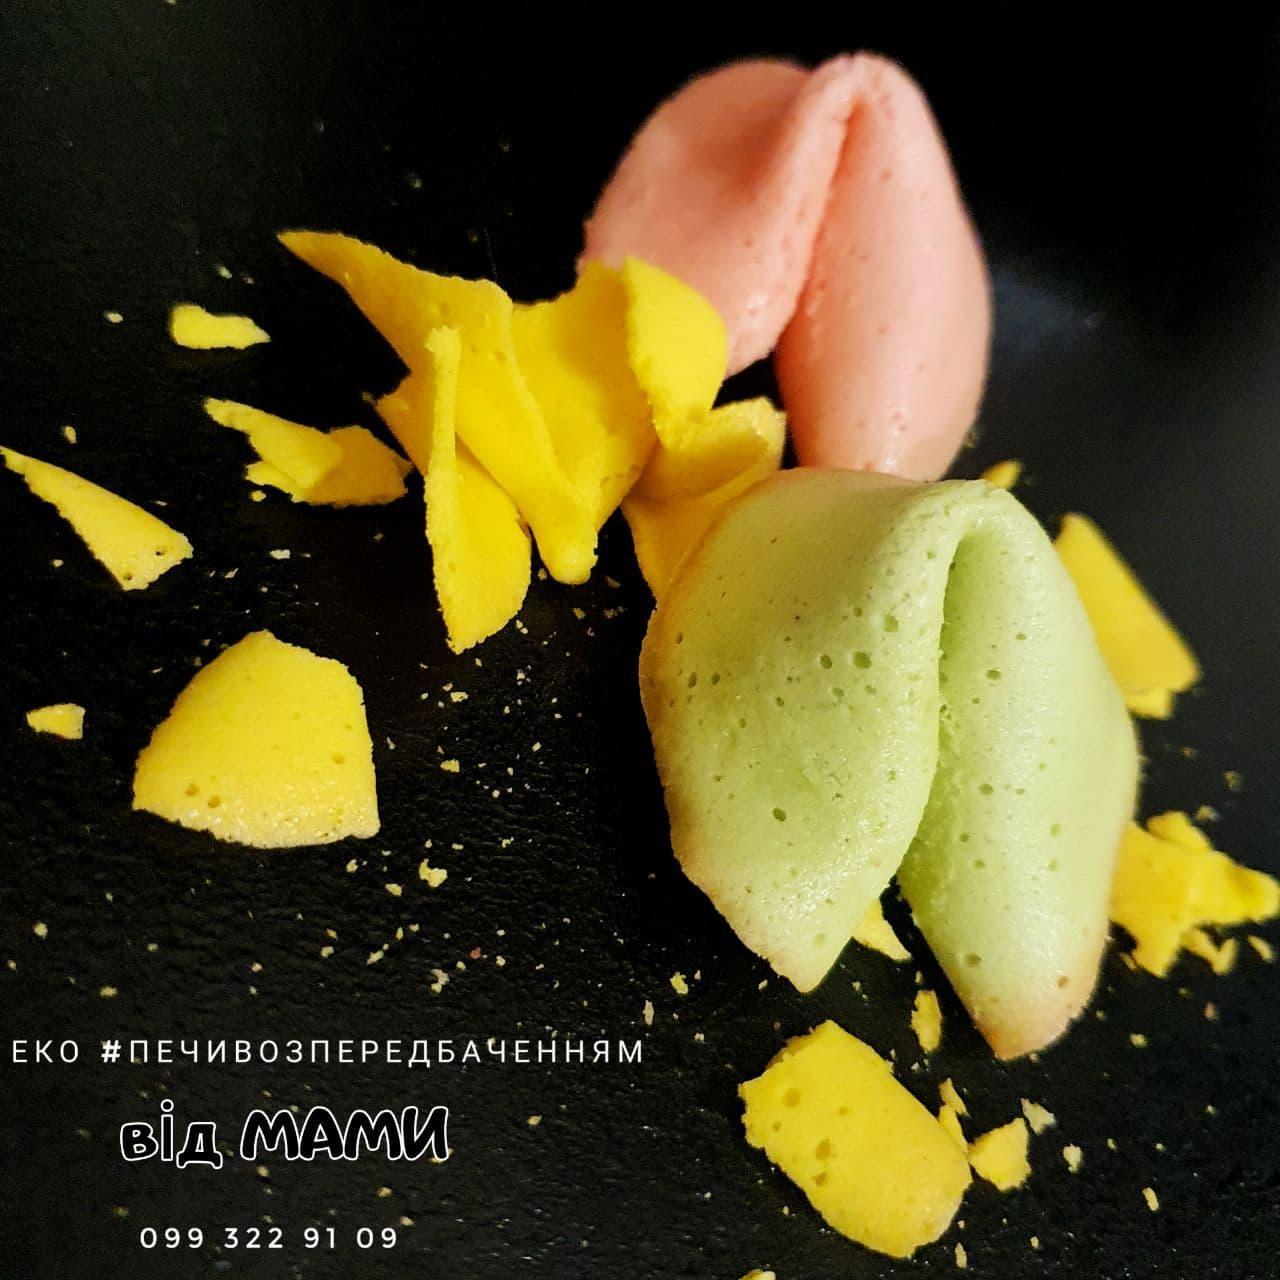 Печенье с предсказаниями, Fortune cookie, Печиво з передбаченнями ручної роботи